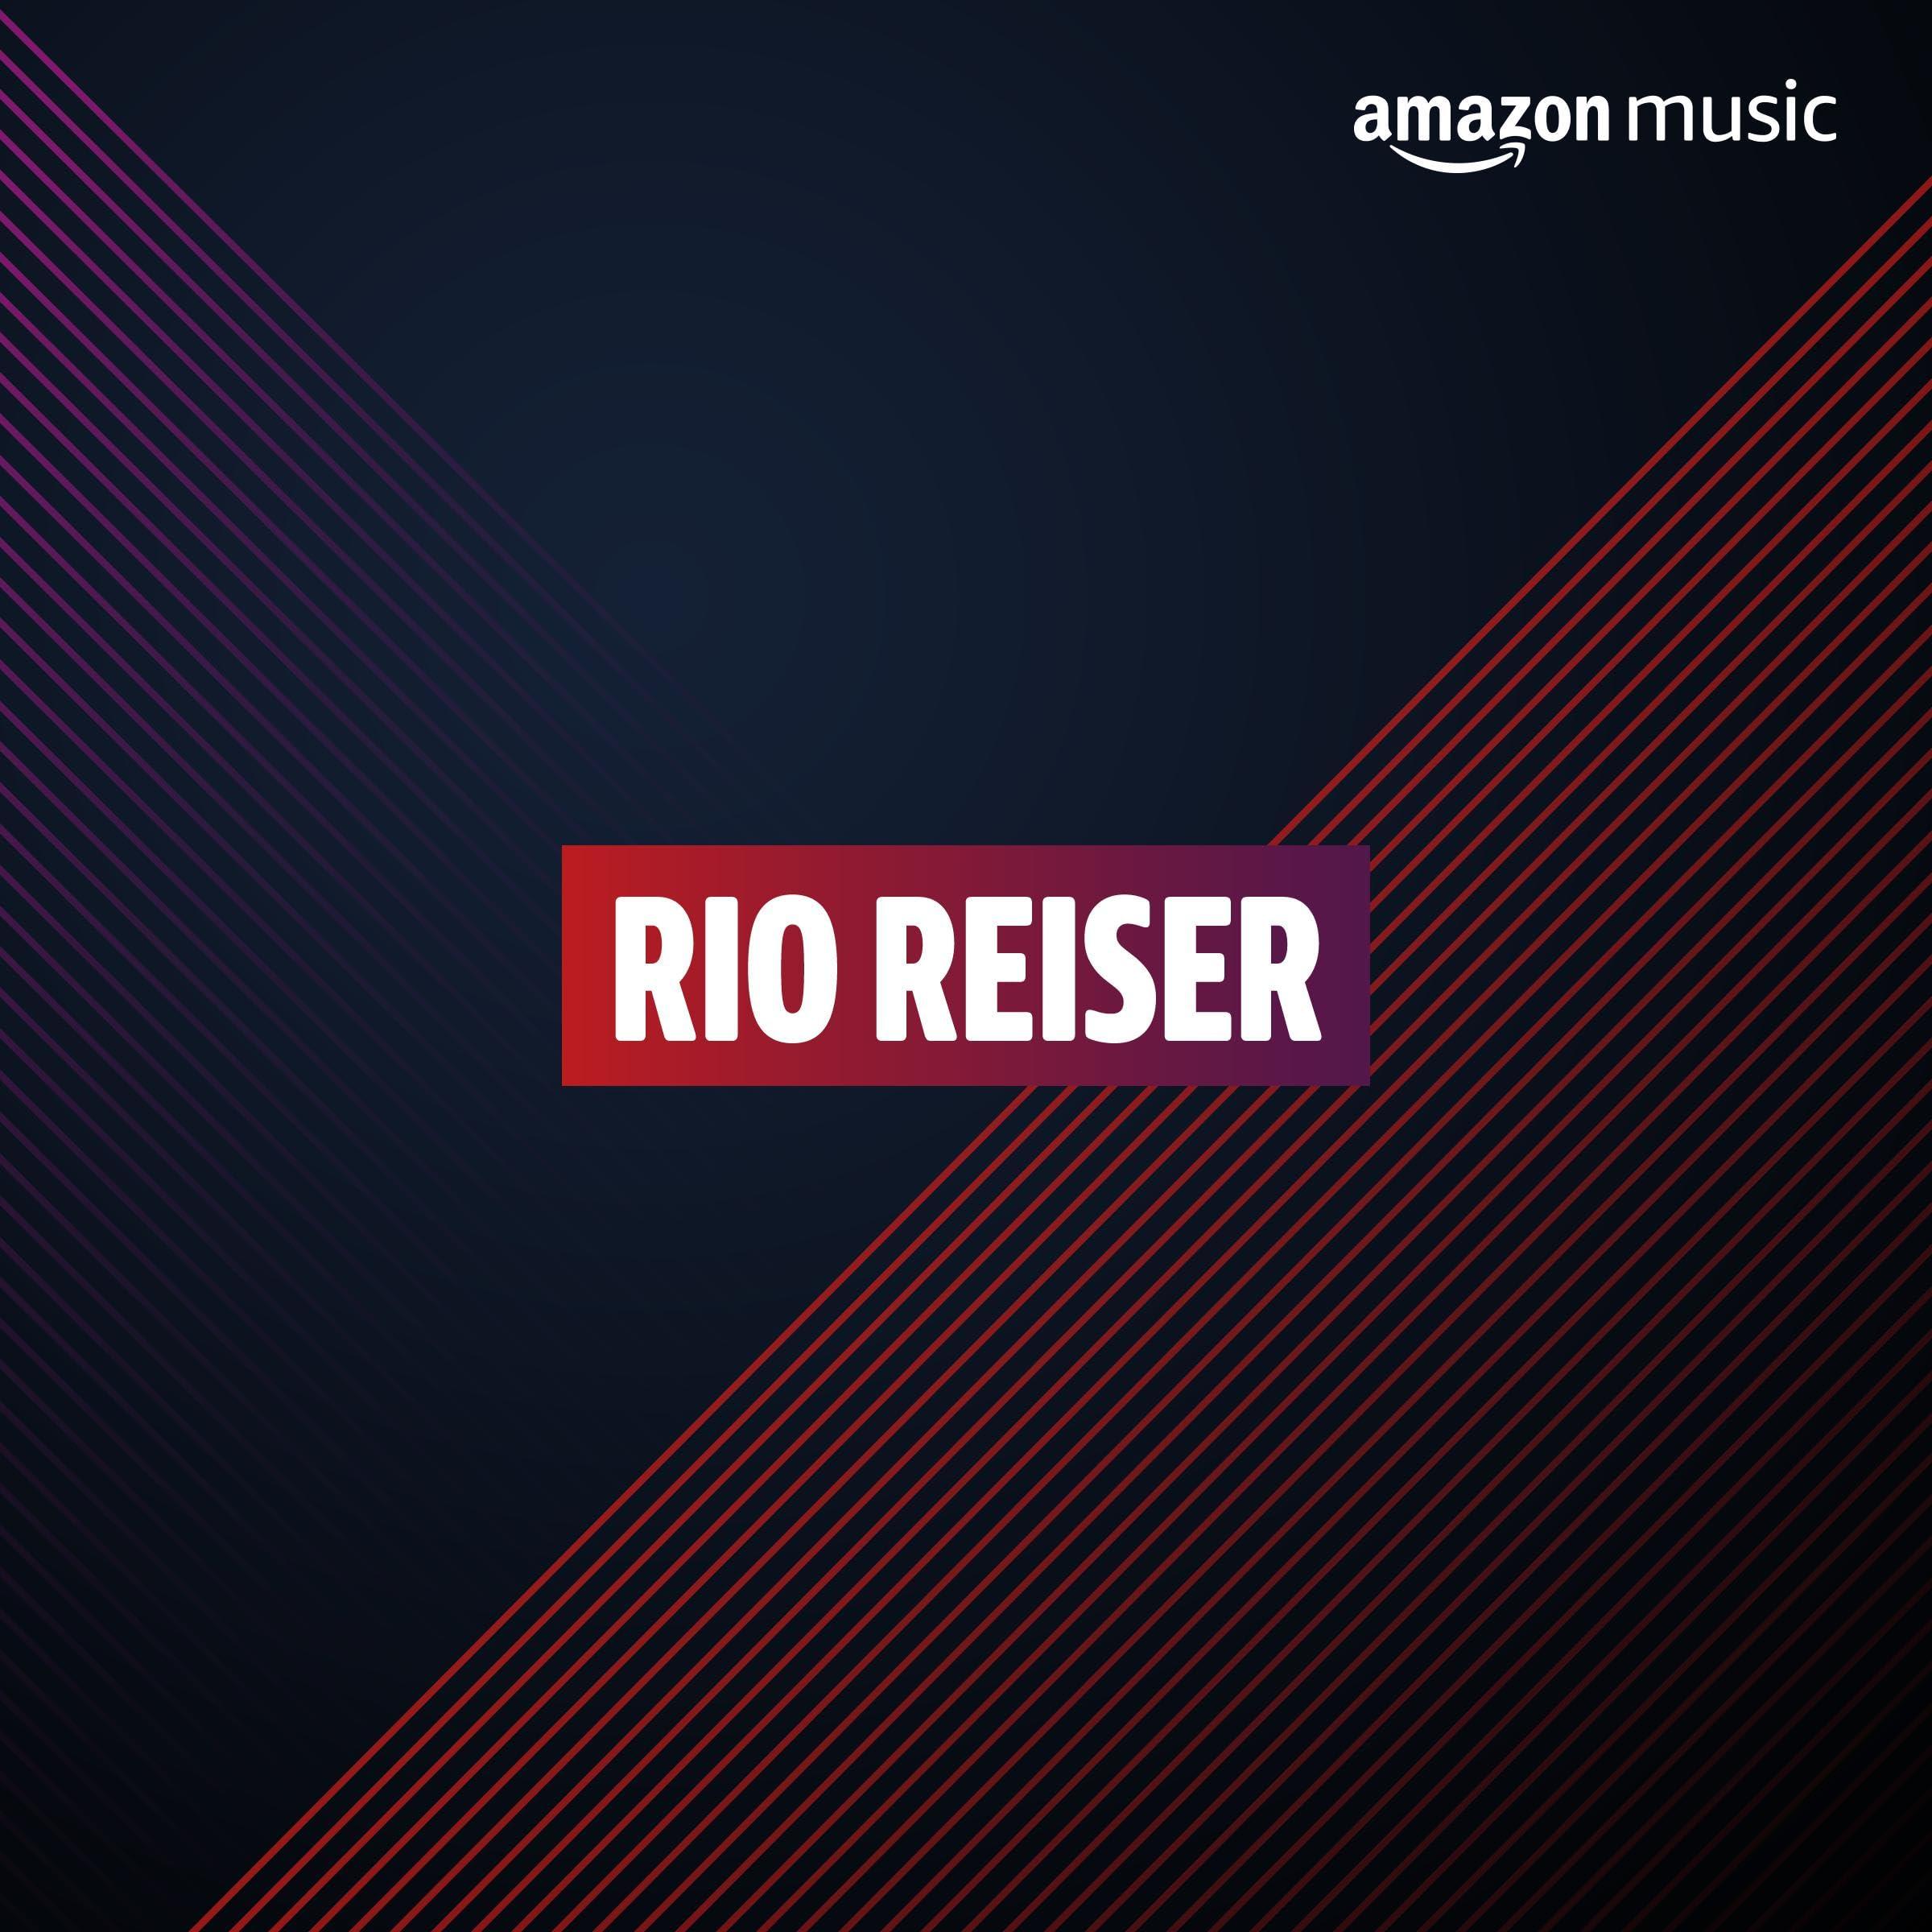 Rio Reiser